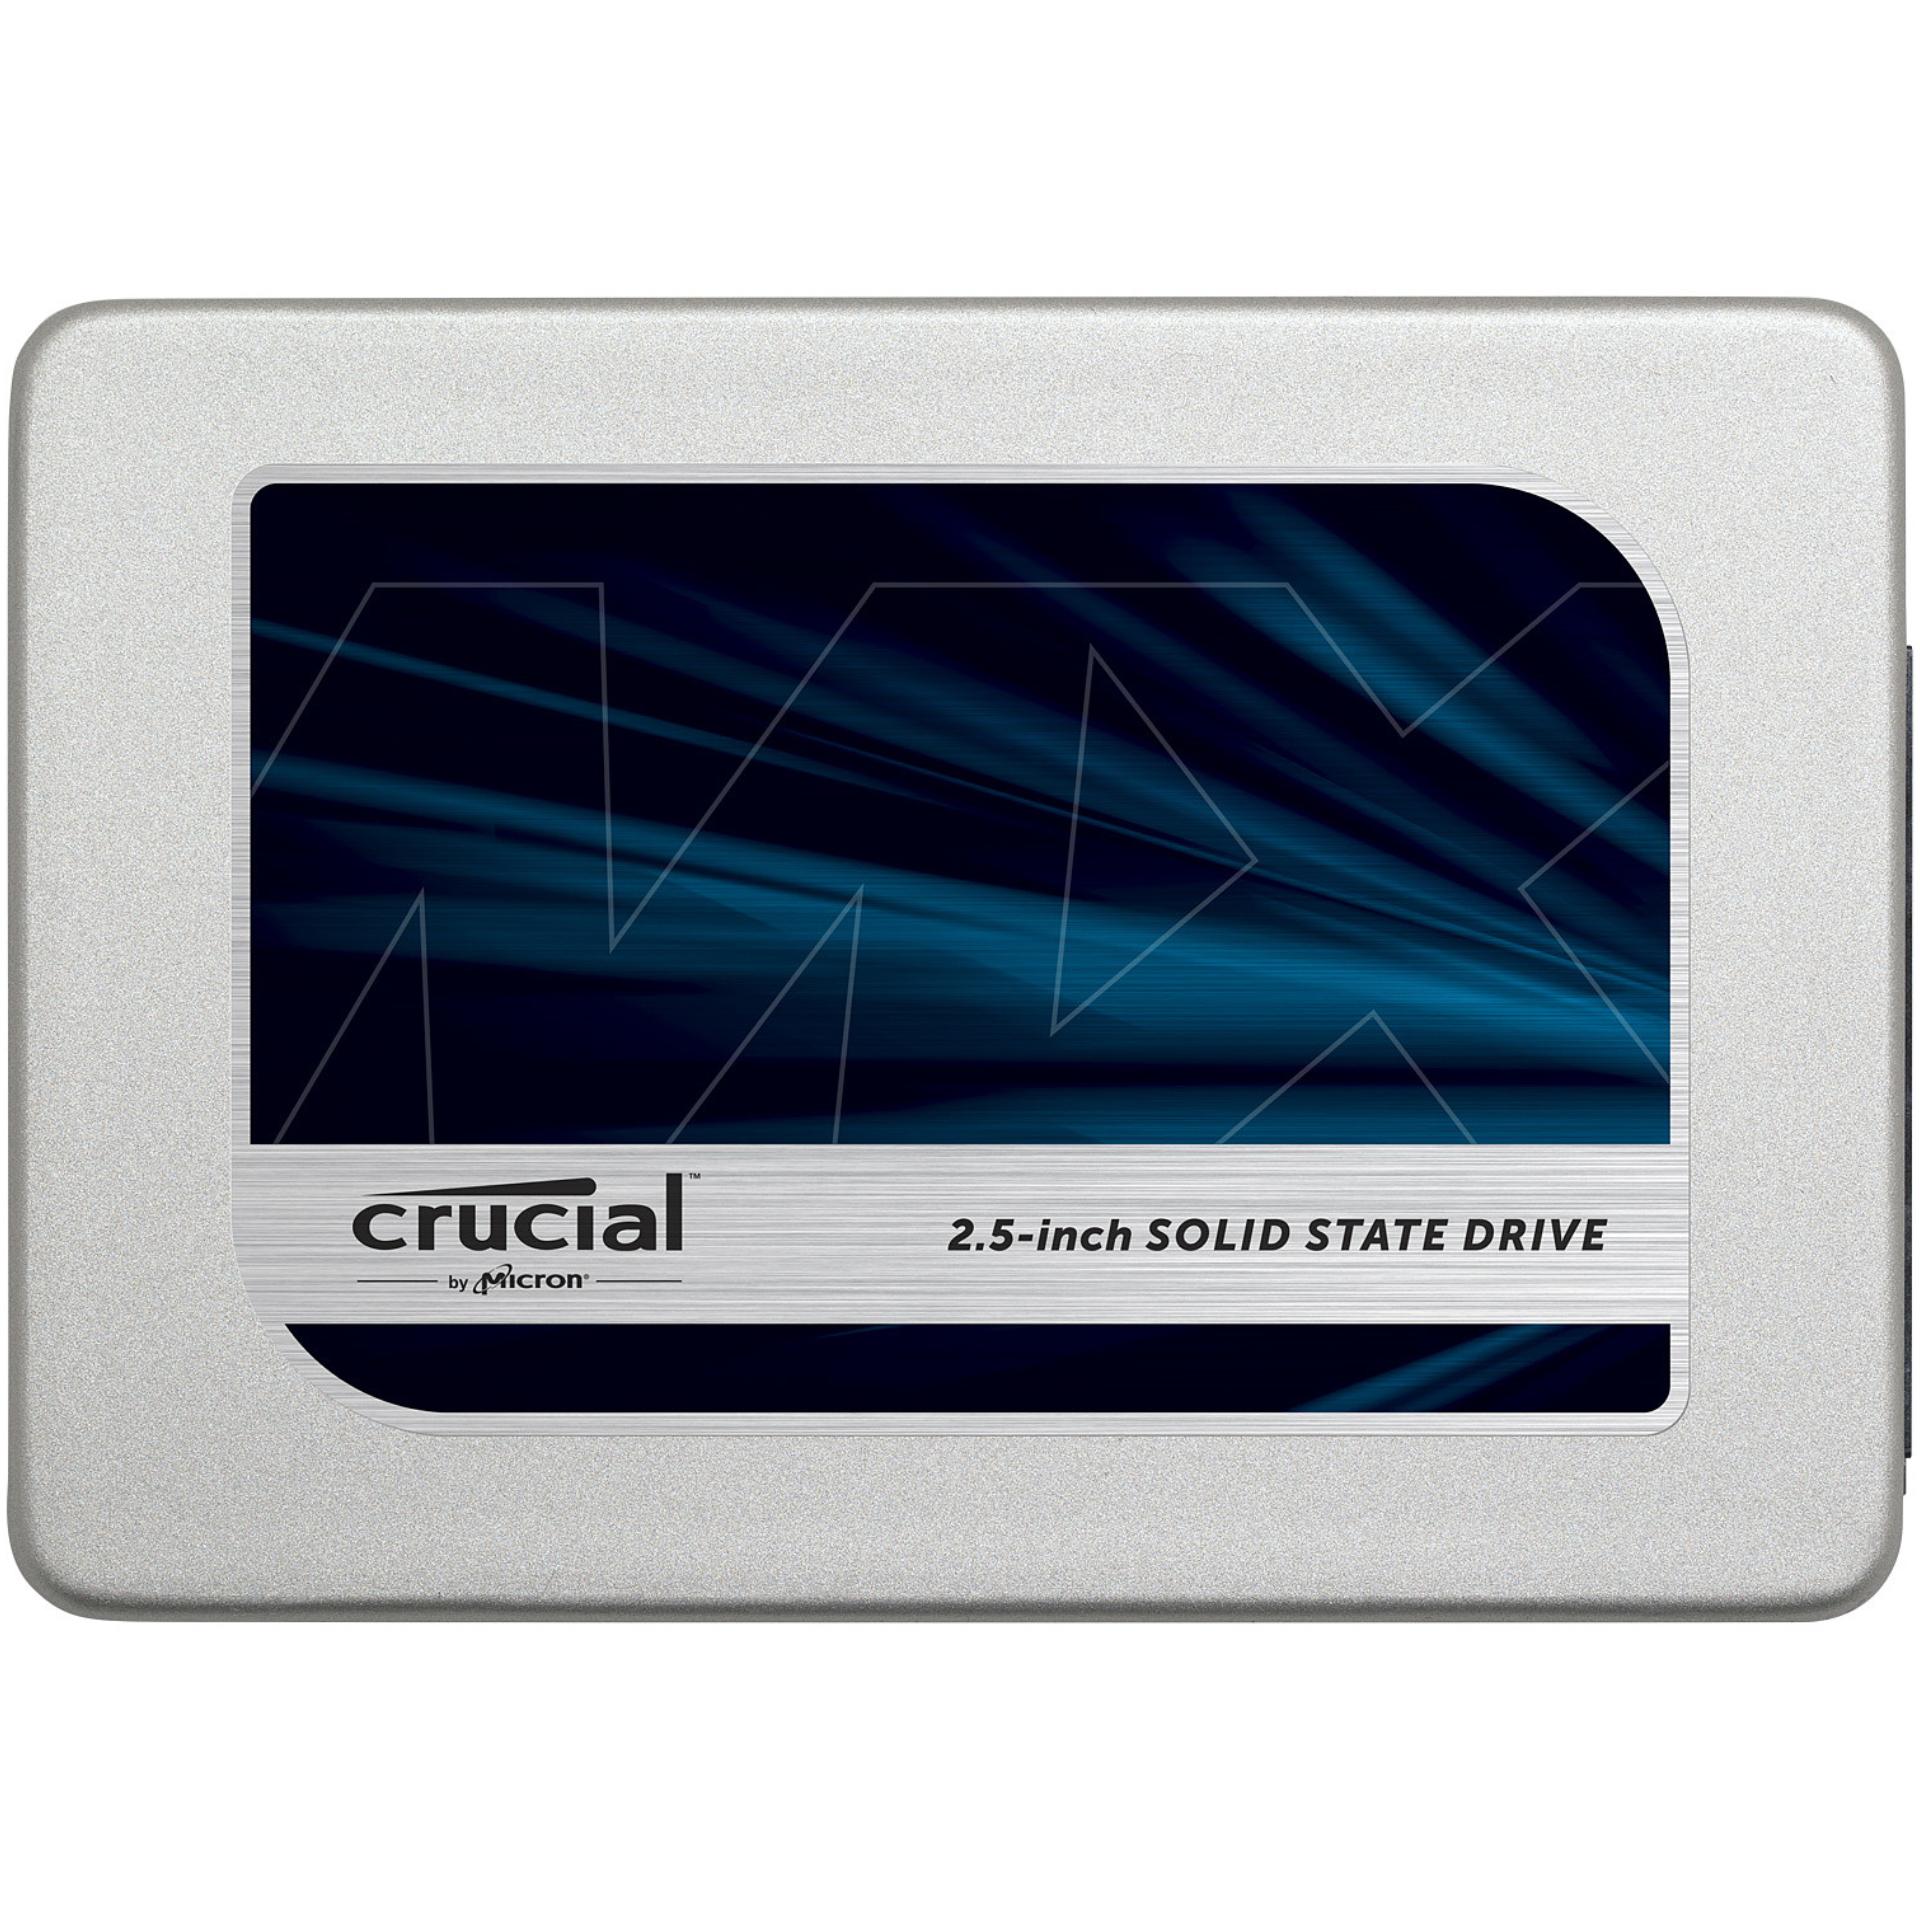 "[Prime] Crucial MX500 1TB SSD   2TB für 152,94€ (2.5"", SATA, 560/510 MB/s, TLC, 1GB DRAM-Cache, 360TB TBW, 5J Garantie)"